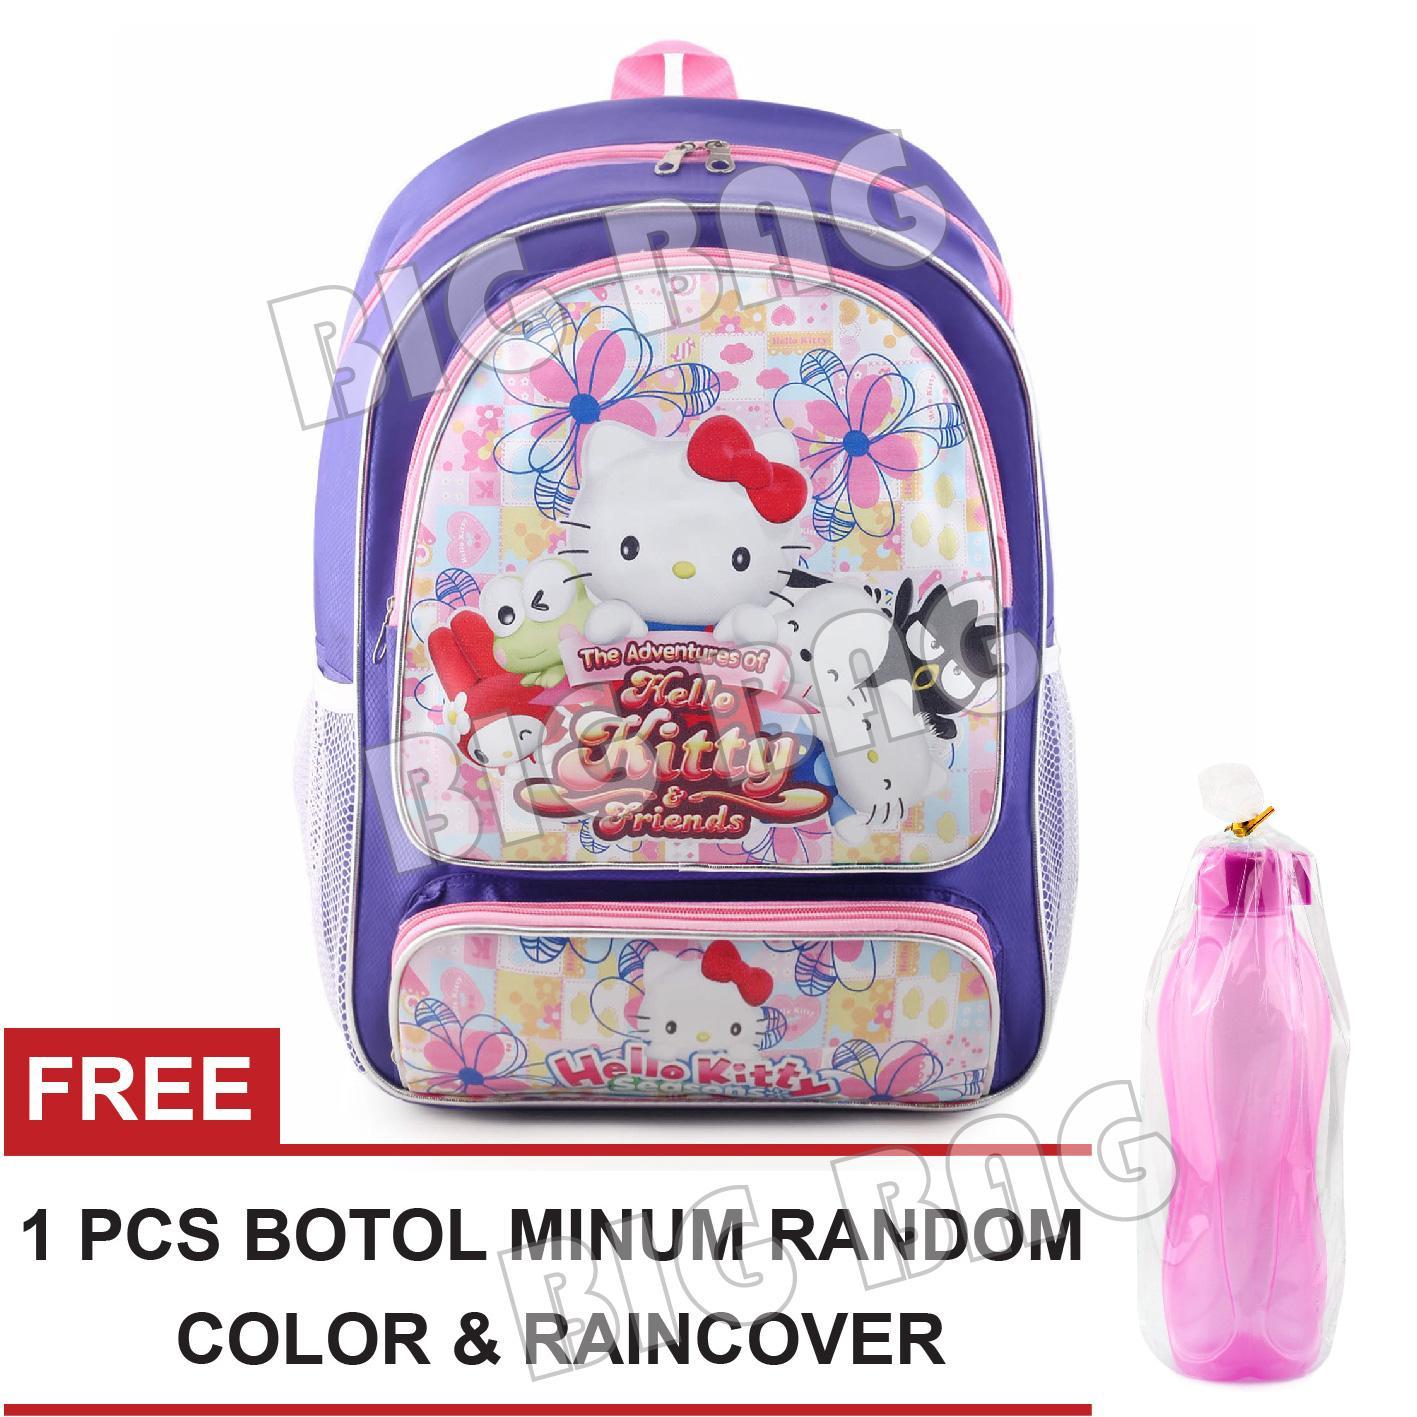 Sale Termurah Fancy Botol Minum BPA Free 500 Ml. Source · Tas Ransel Anak Perempuan Karakter - Hello Kitty - Properly .SC - PURPLE + FREE